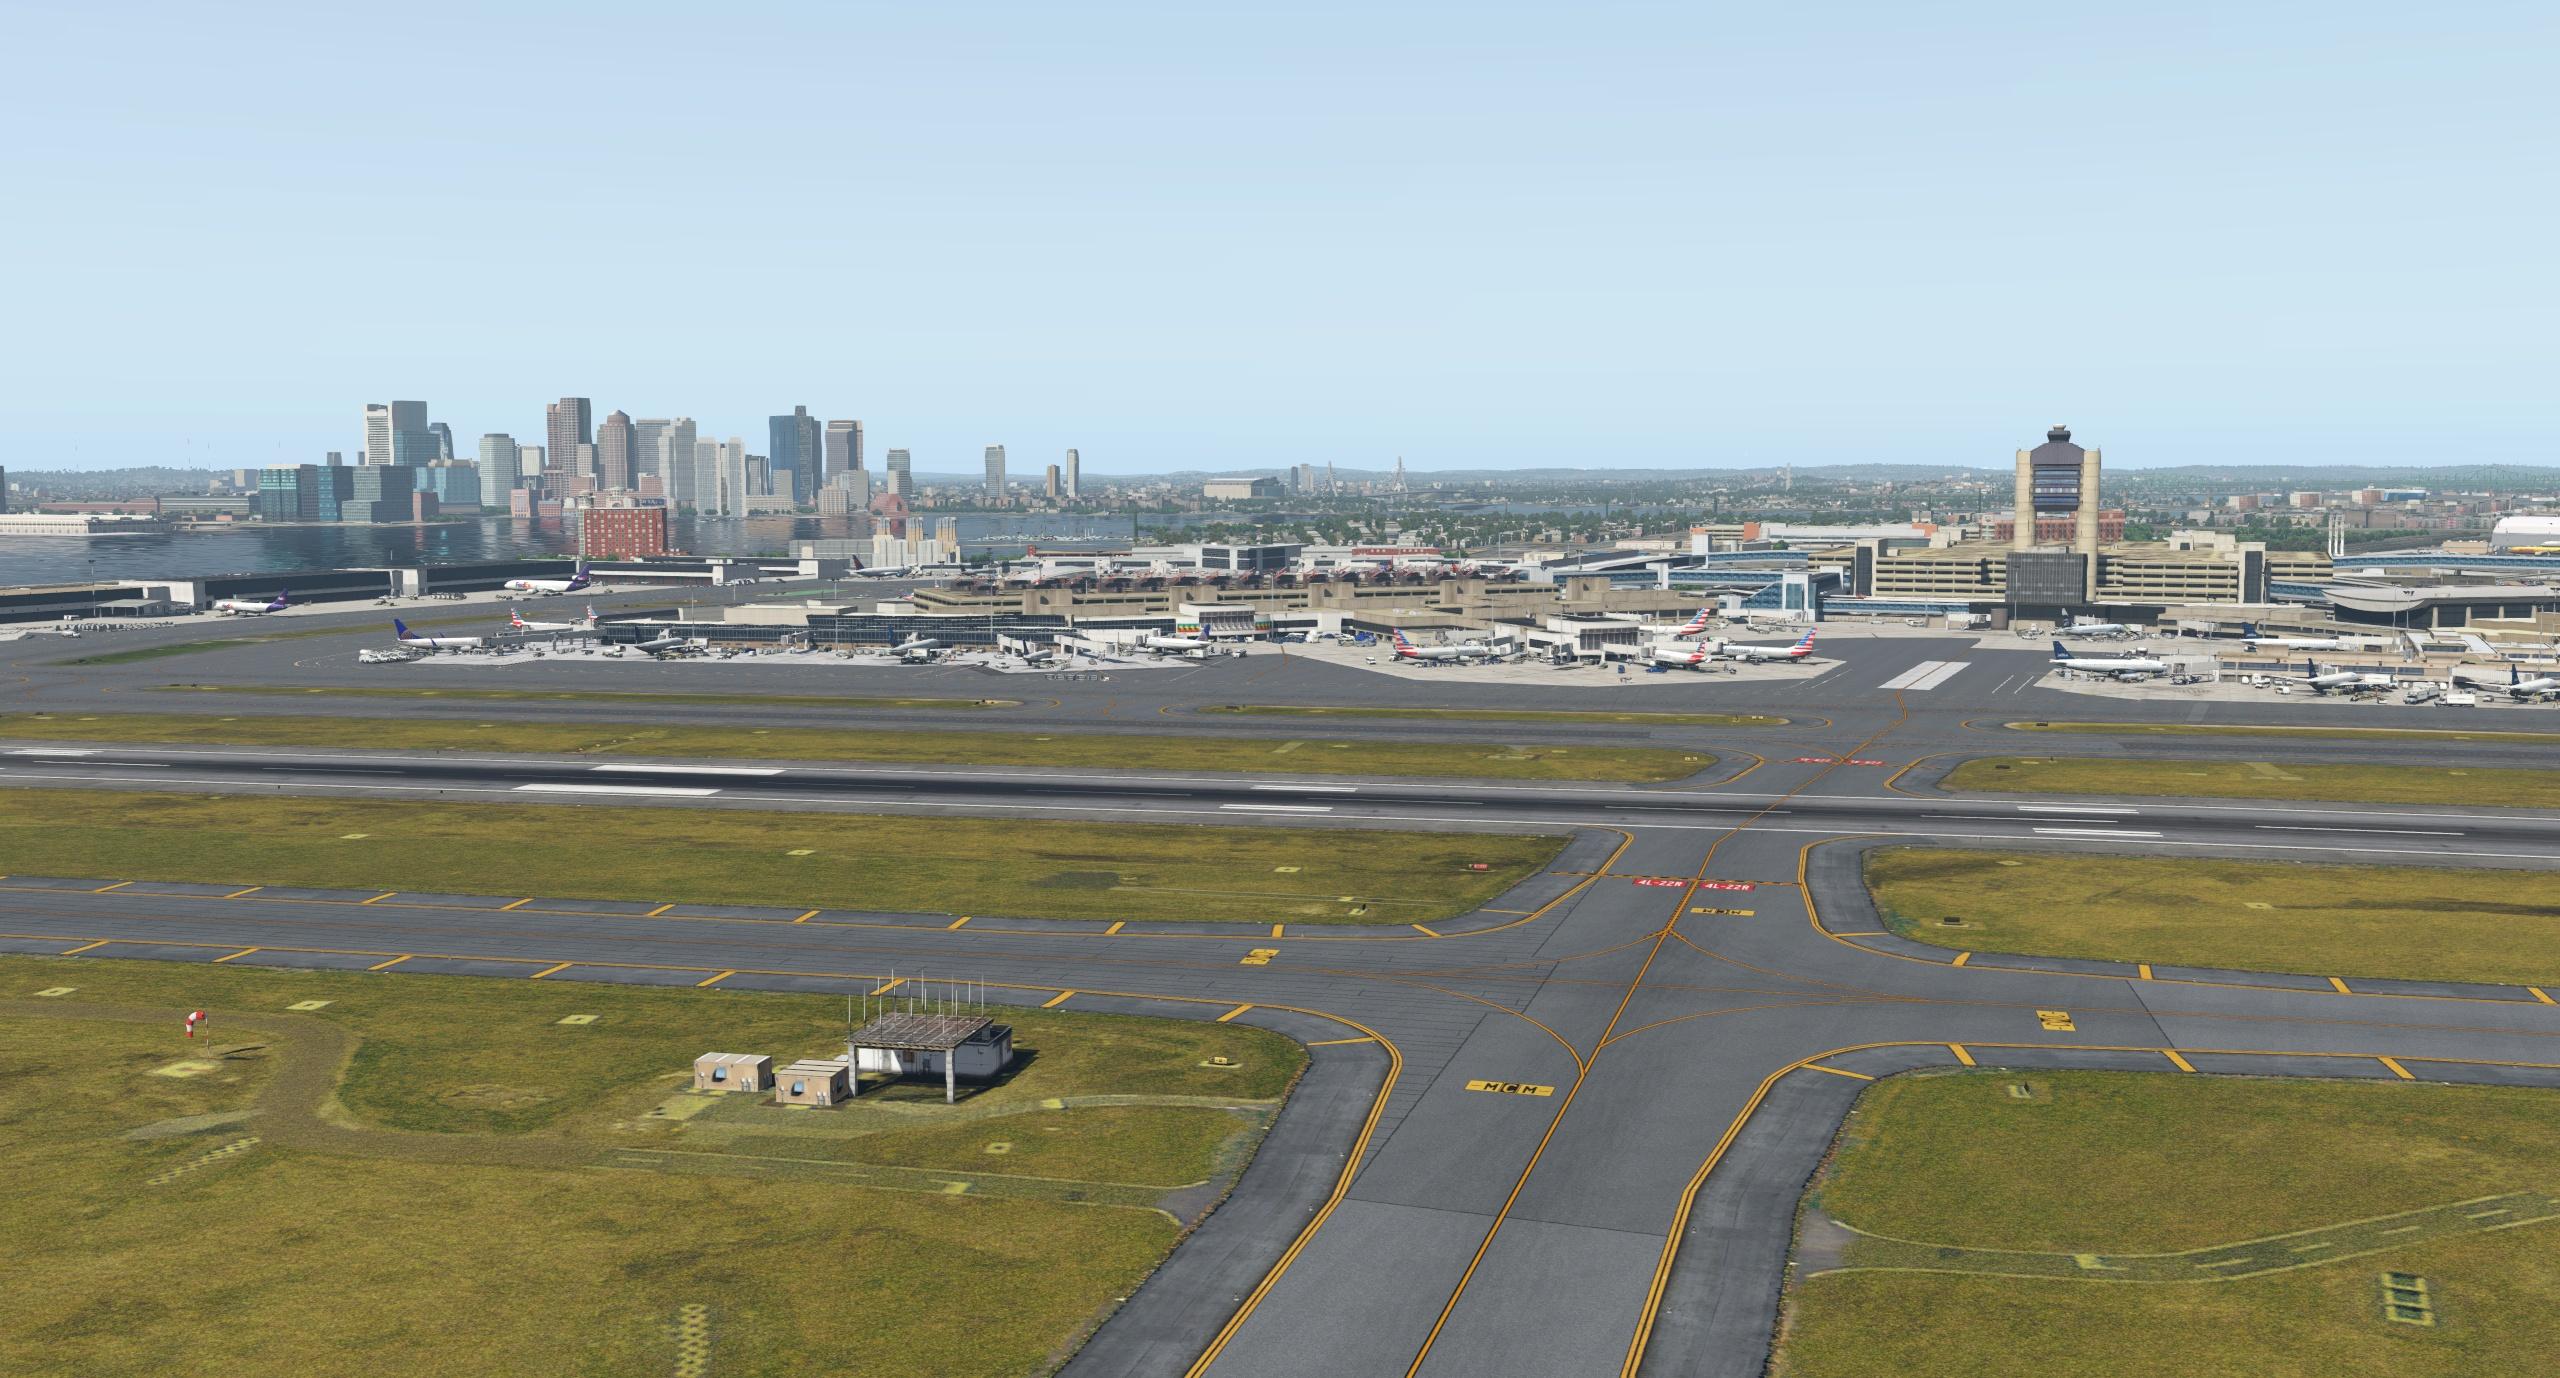 The incredible Boston scenery by Mister X - The AVSIM Screen